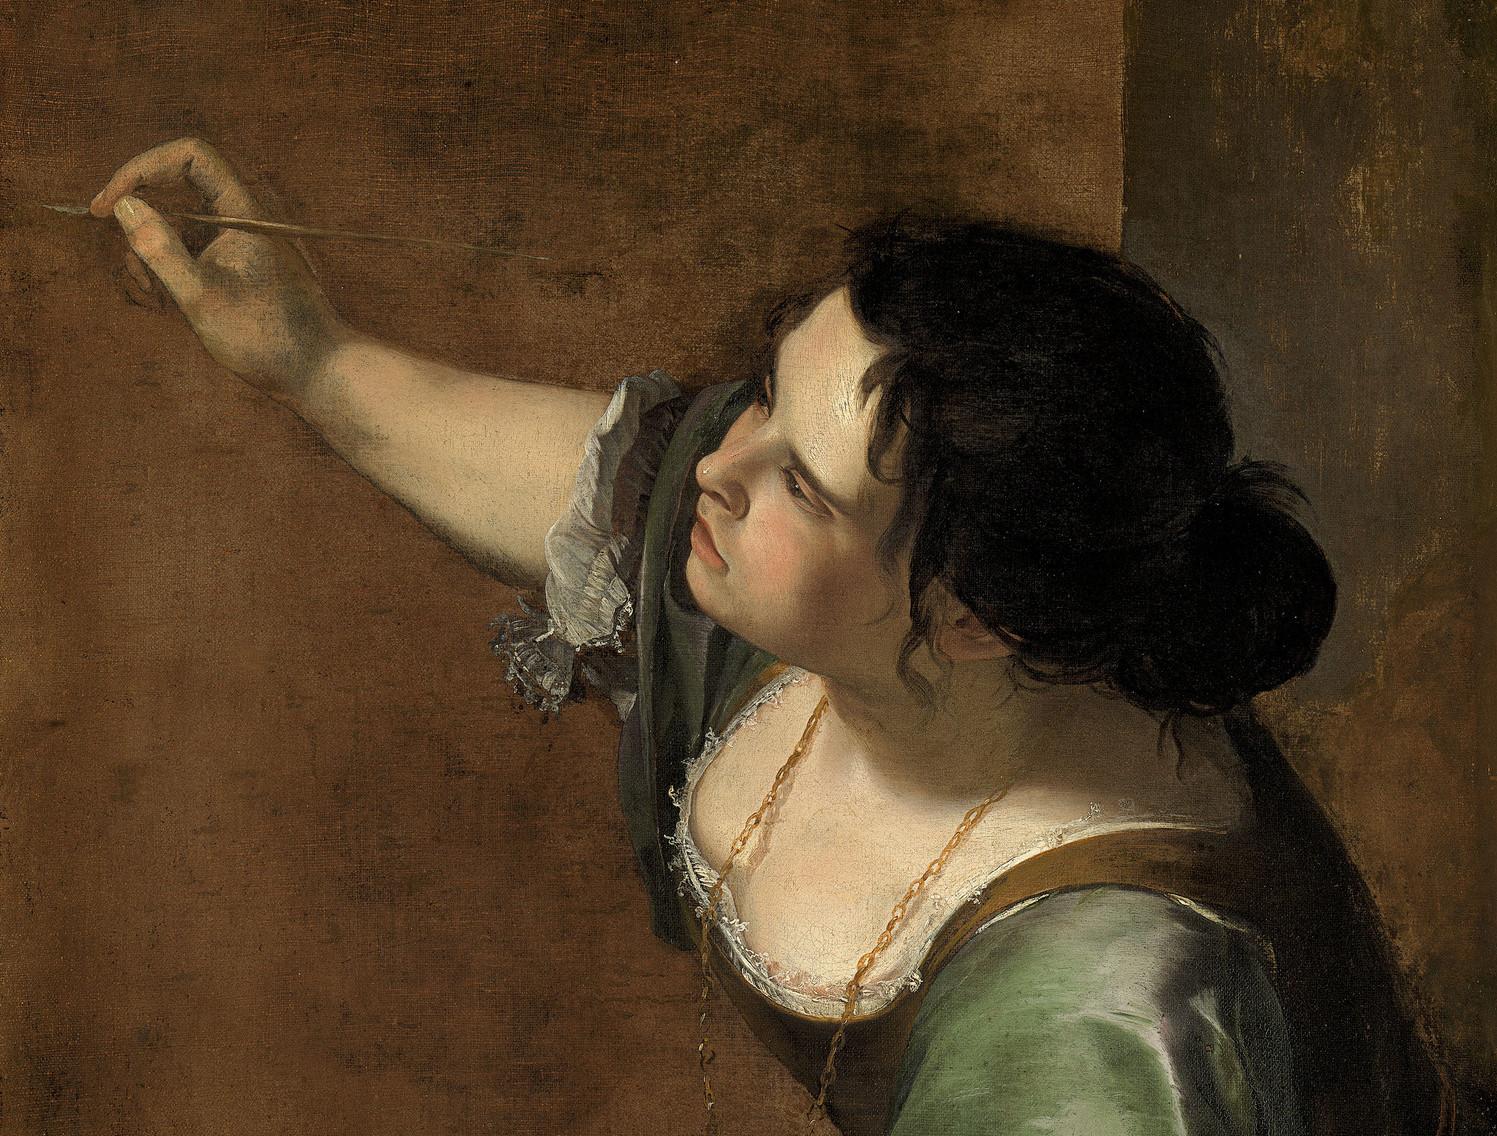 Artemisia Gentileschi. Il dramma di una femminista ante litteram